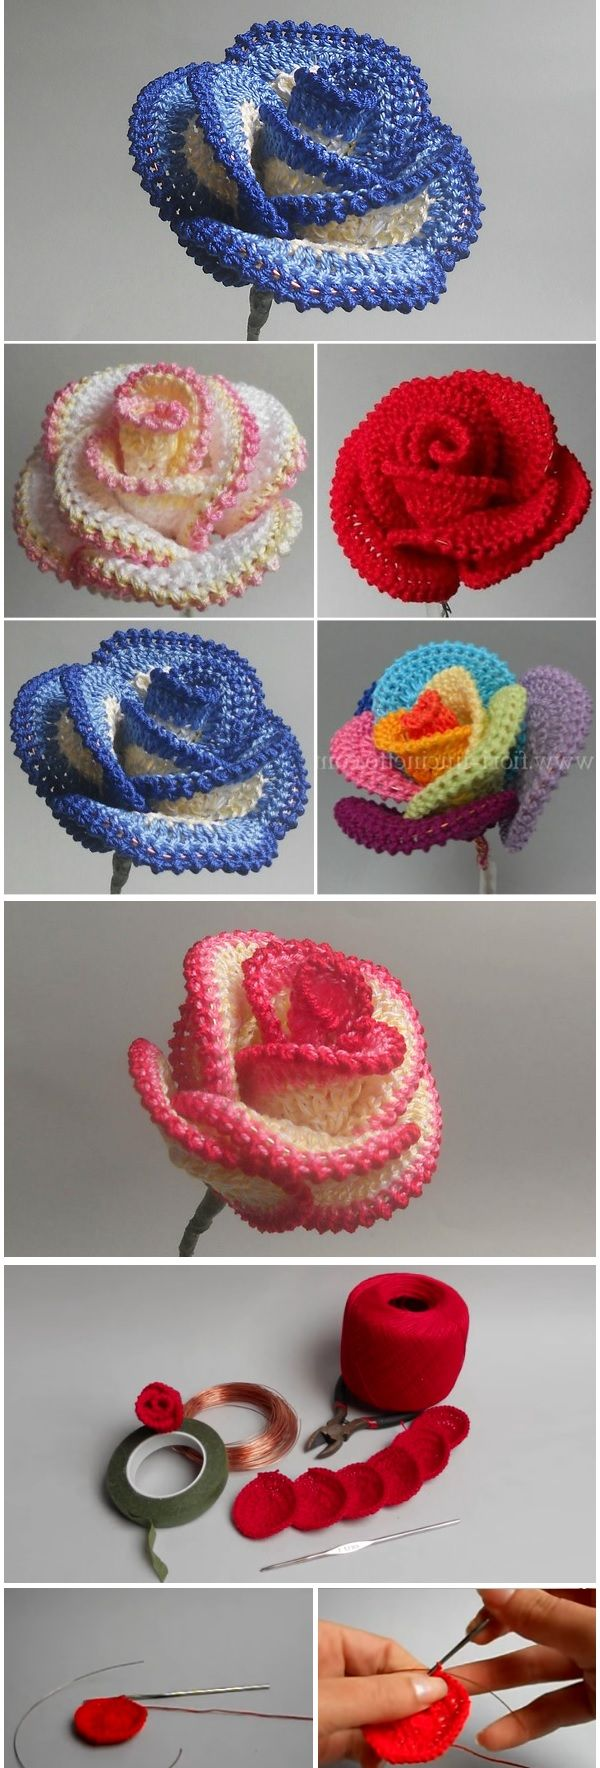 How to Crochet the Perfect Rose   Häkeln, Handarbeiten und Häkelmuster